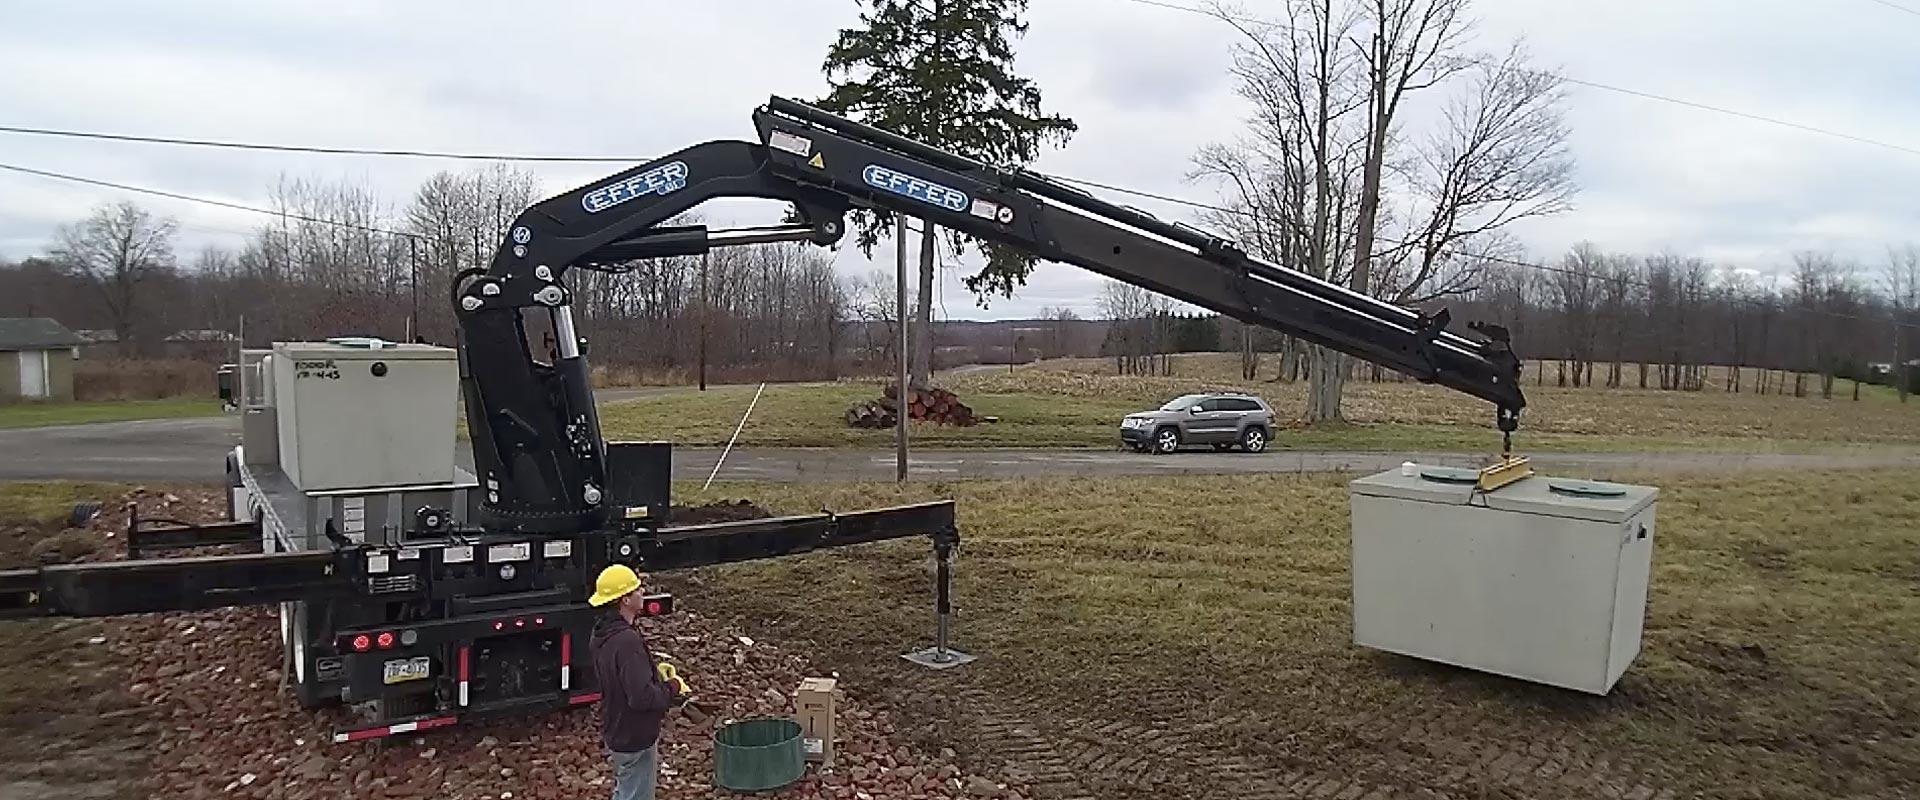 effer effer crane mobile cranes truck cranes rh effer com Effer Crane 220 Model 3s North American Lifting Equipment